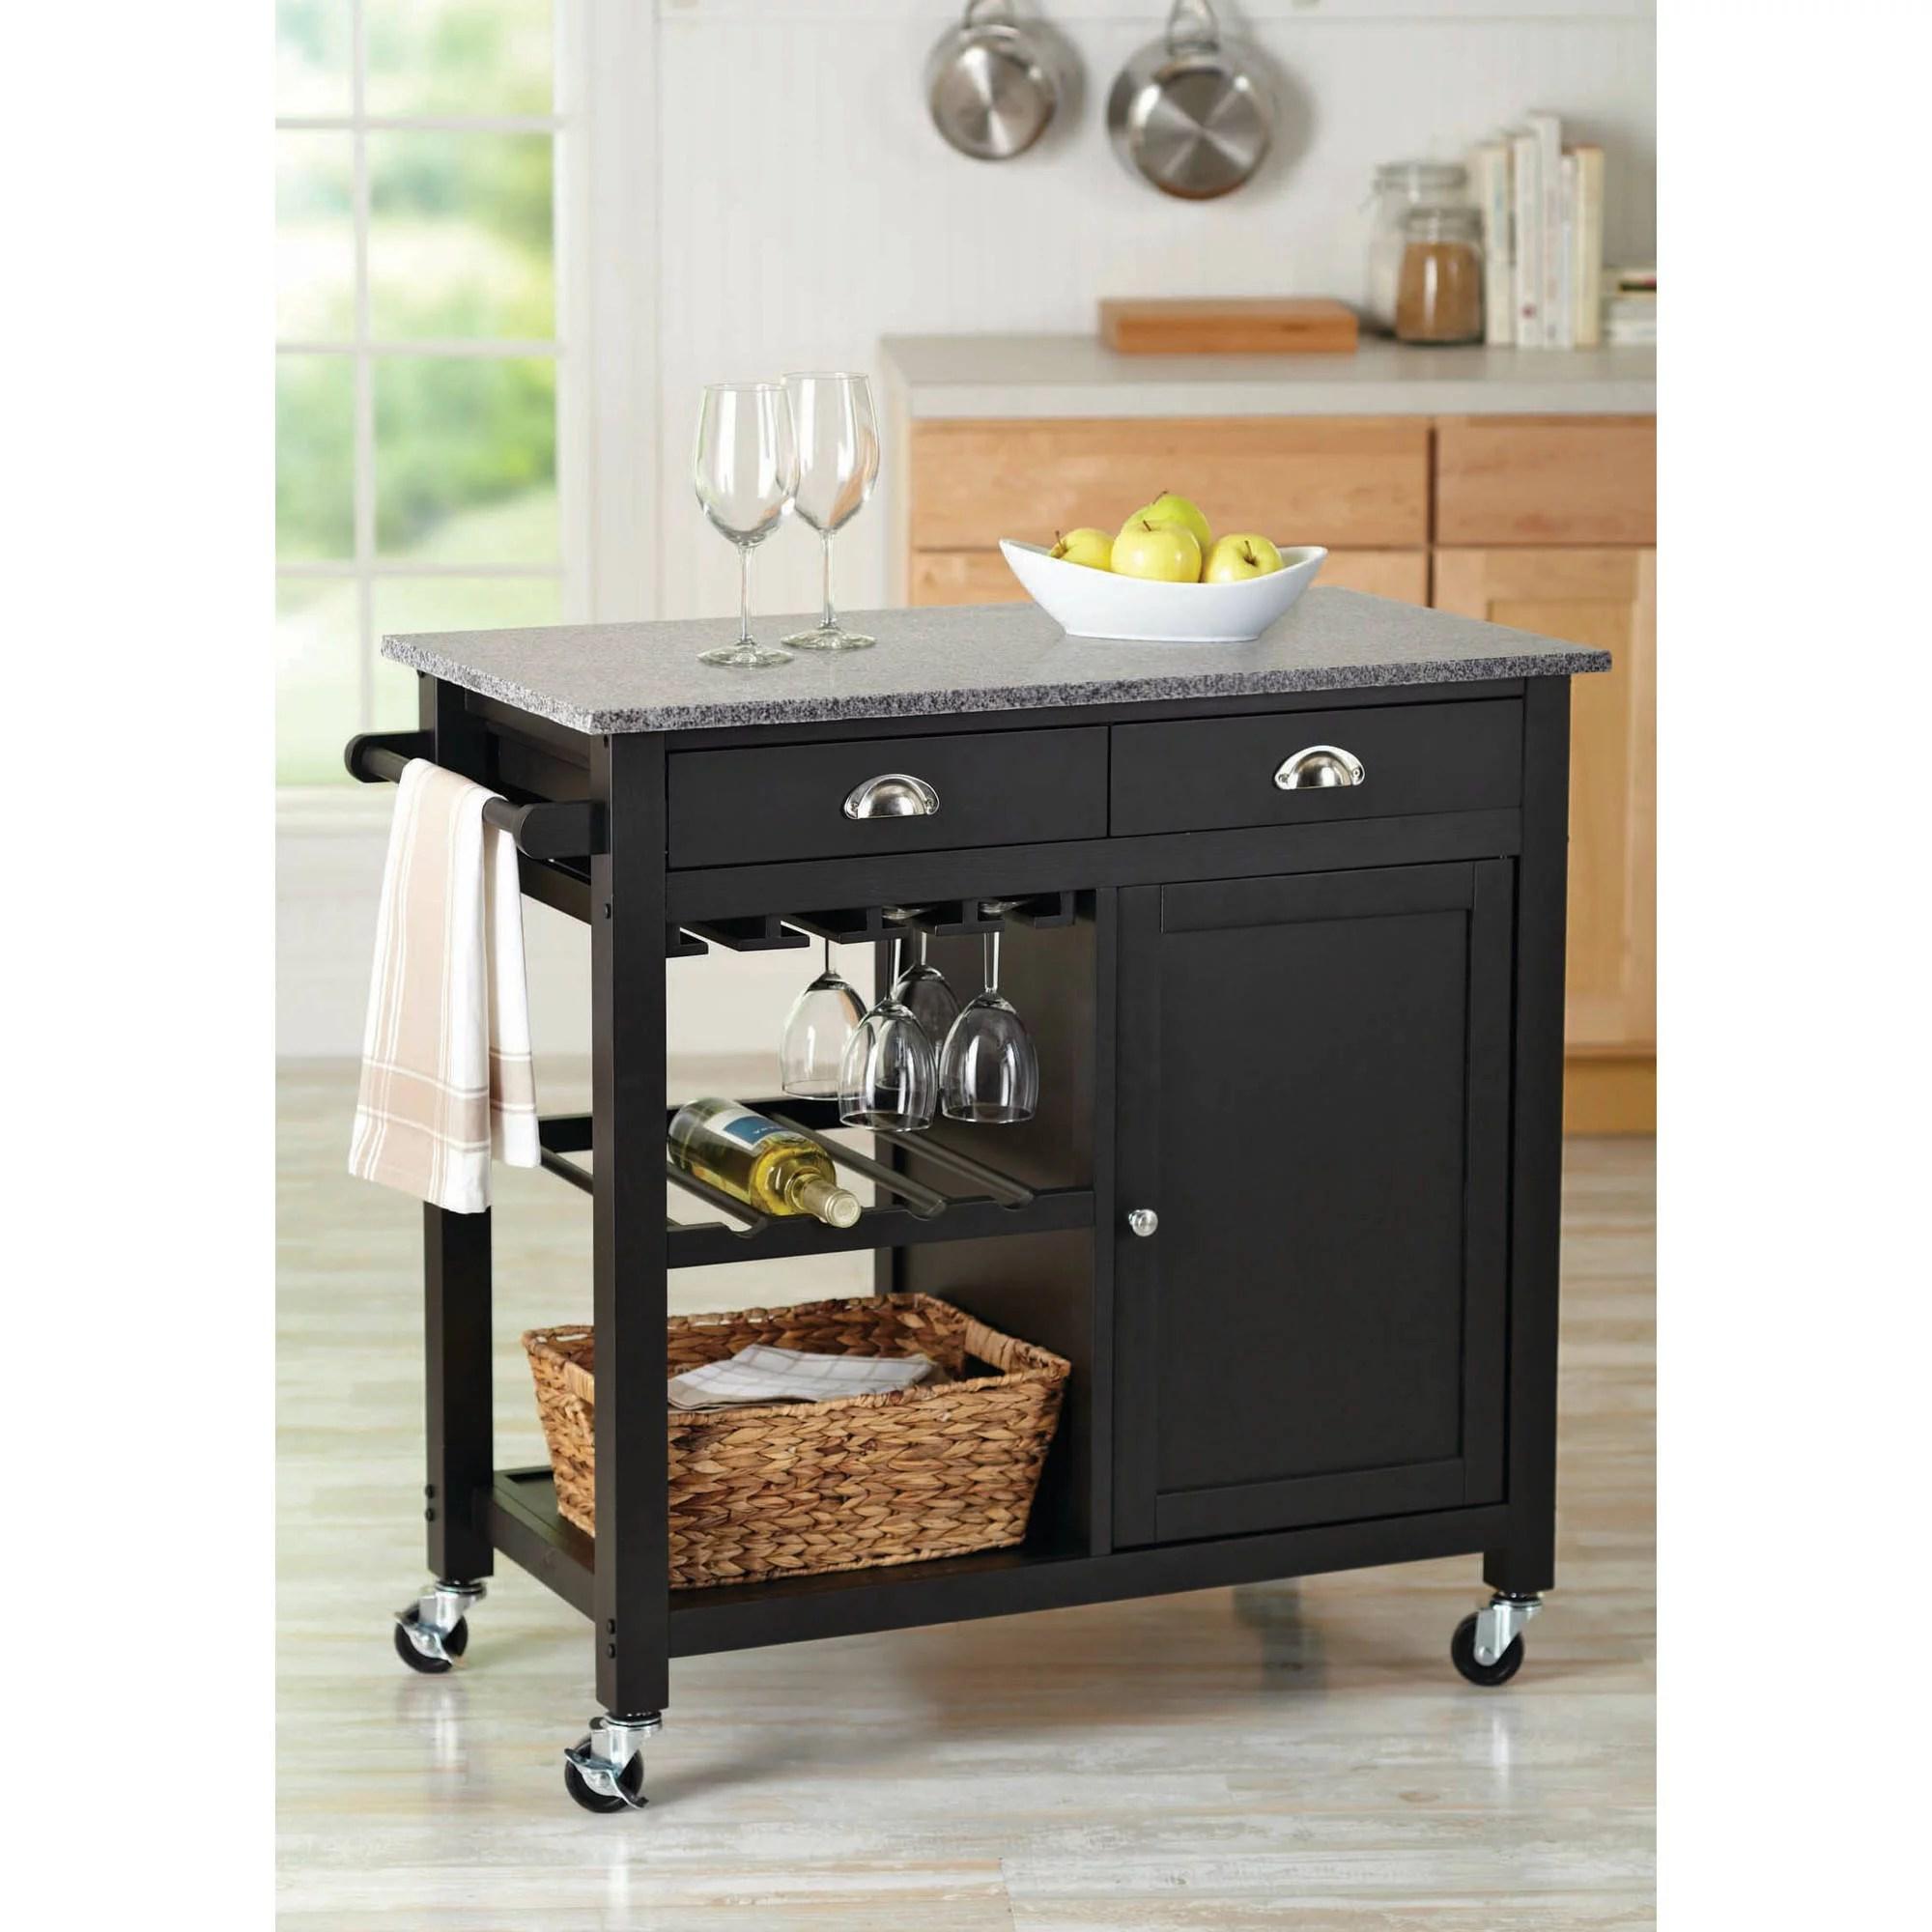 Better Homes And Gardens Deluxe Kitchen Cart Island Black Walmart Com